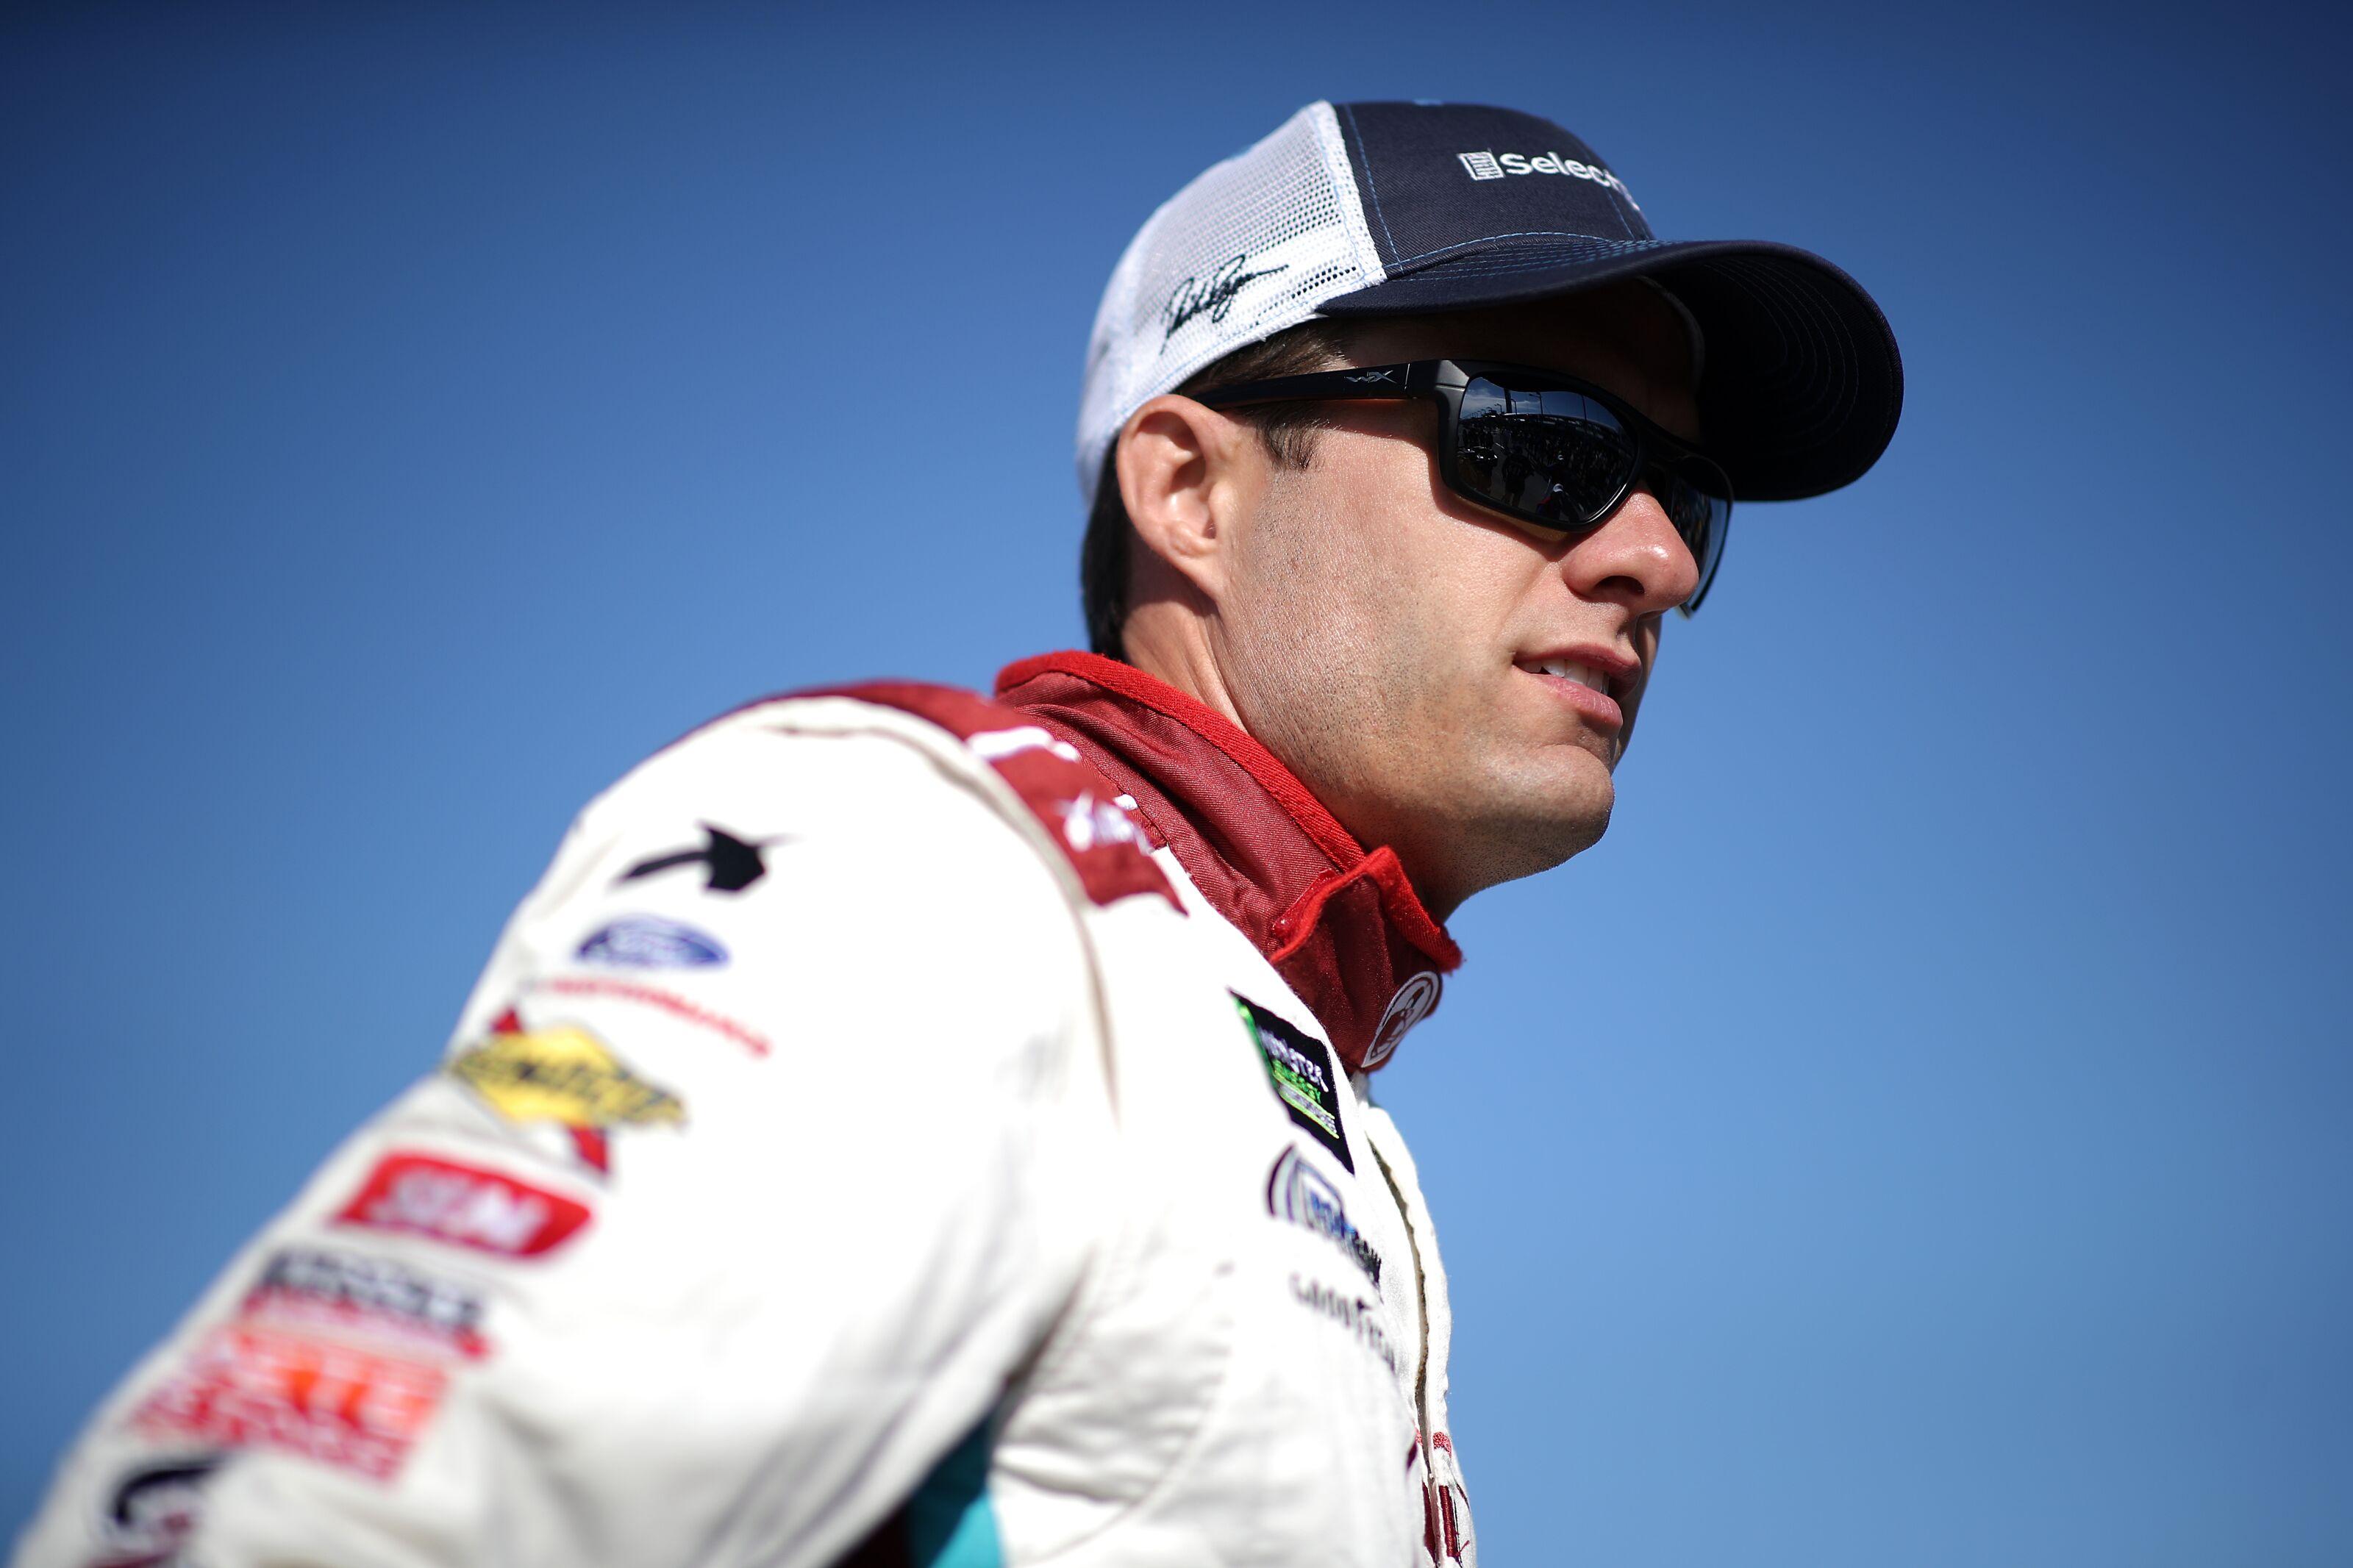 NASCAR: The low-key significance of David Ragan's Daytona 500 deal